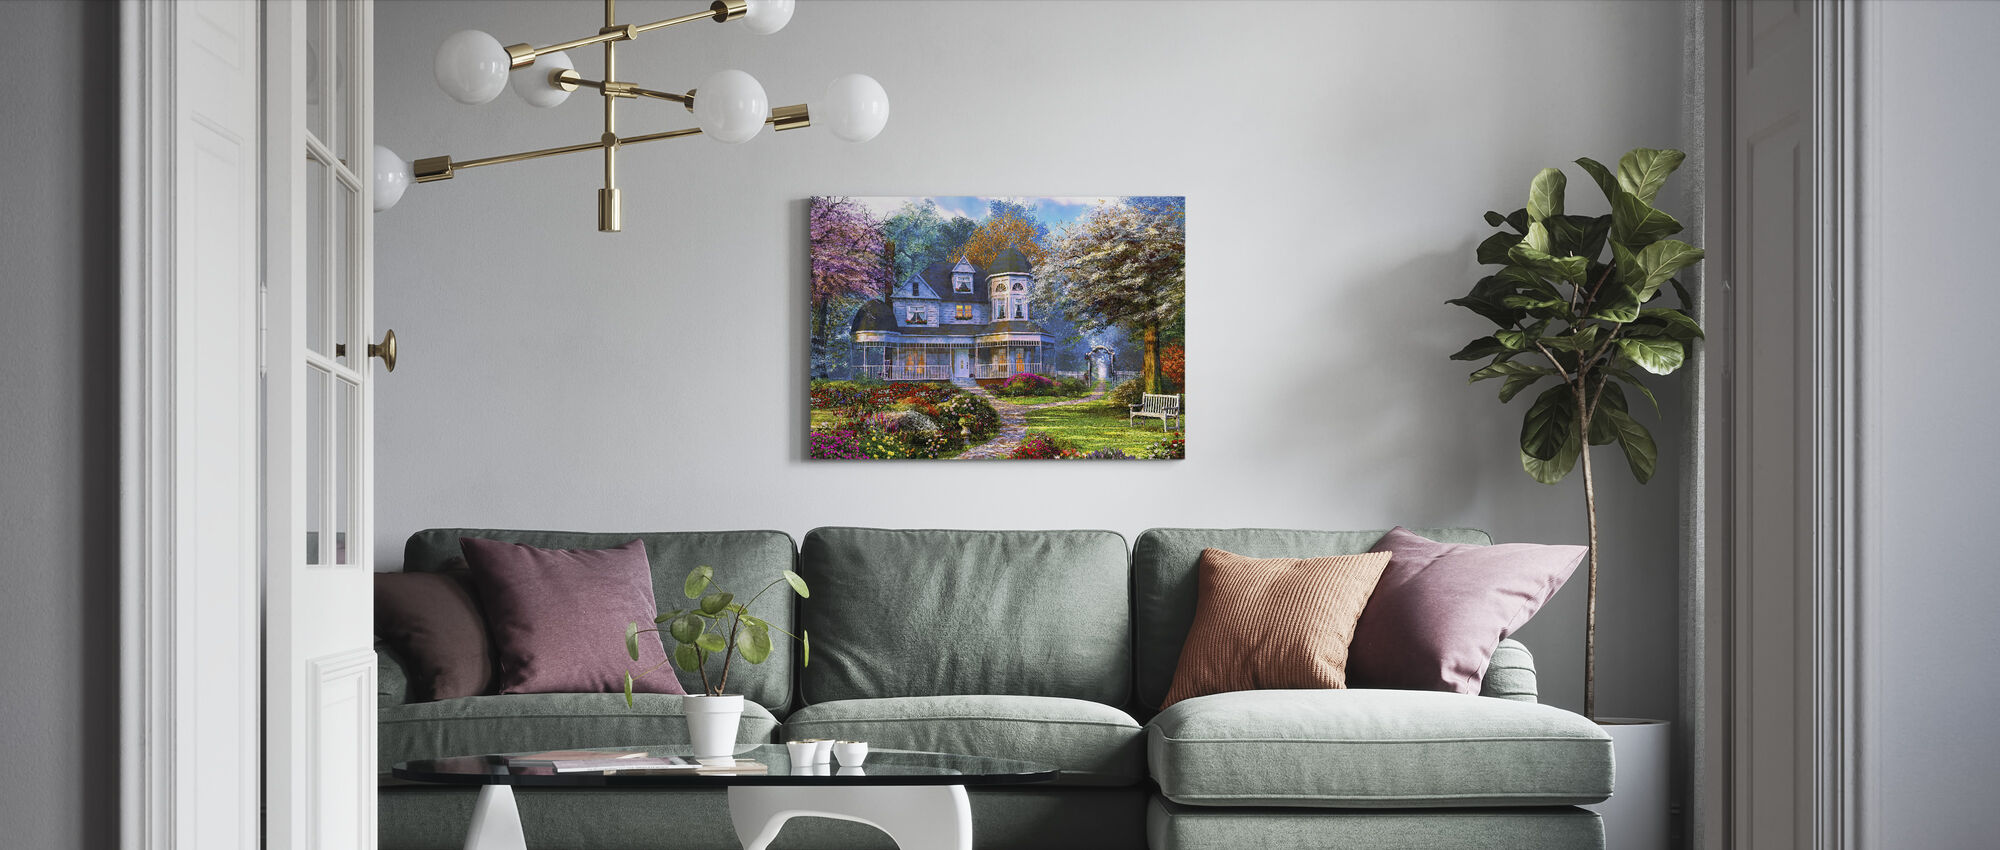 Viktorianska Hem - Canvastavla - Vardagsrum